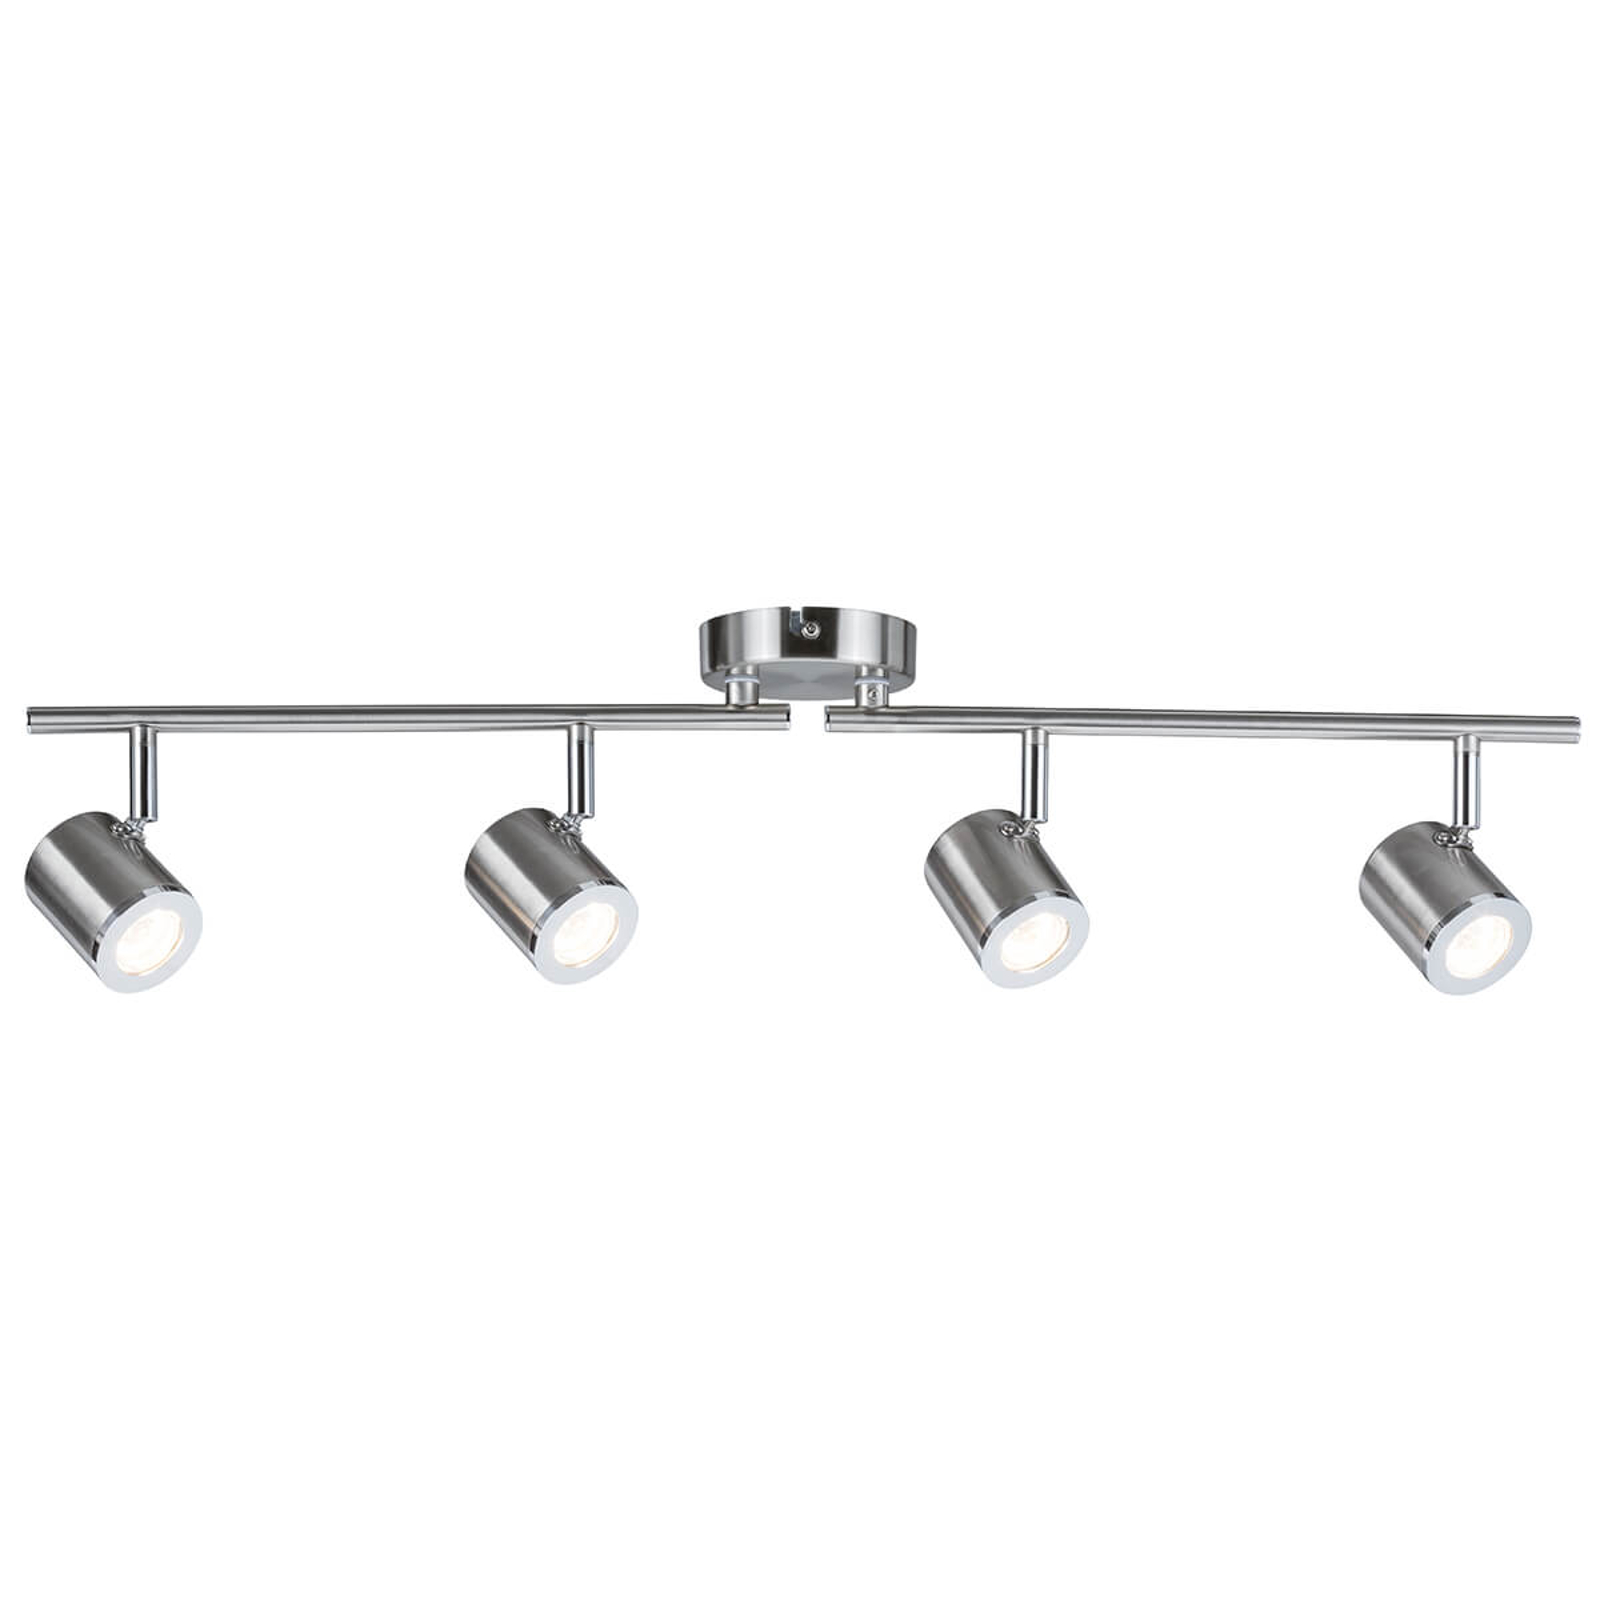 Tumbler - 4-punktowa lampa sufitowa niklowana